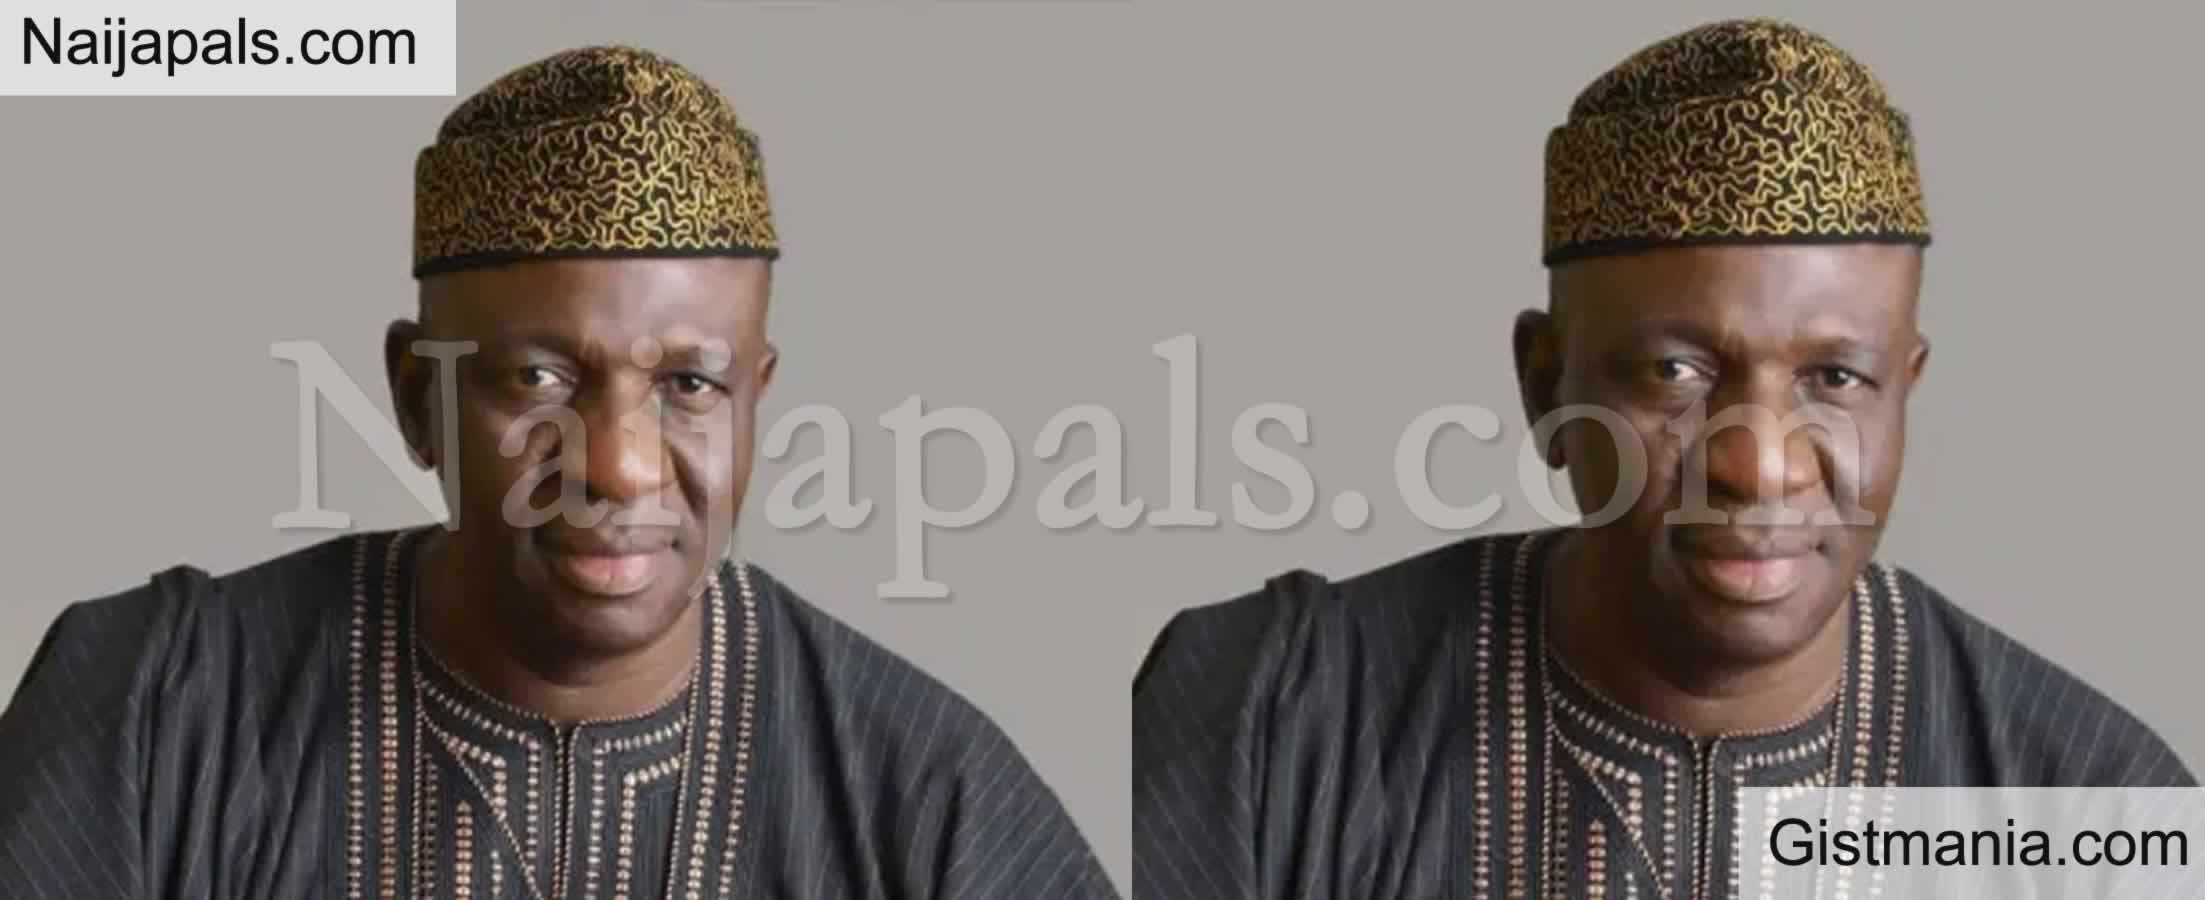 <img alt='.' class='lazyload' data-src='https://img.gistmania.com/emot/news.gif' /> <b>Senator Urhoghide Reveals That Civil Servants Steal Nigeria's Wealth Not Politicians</b>